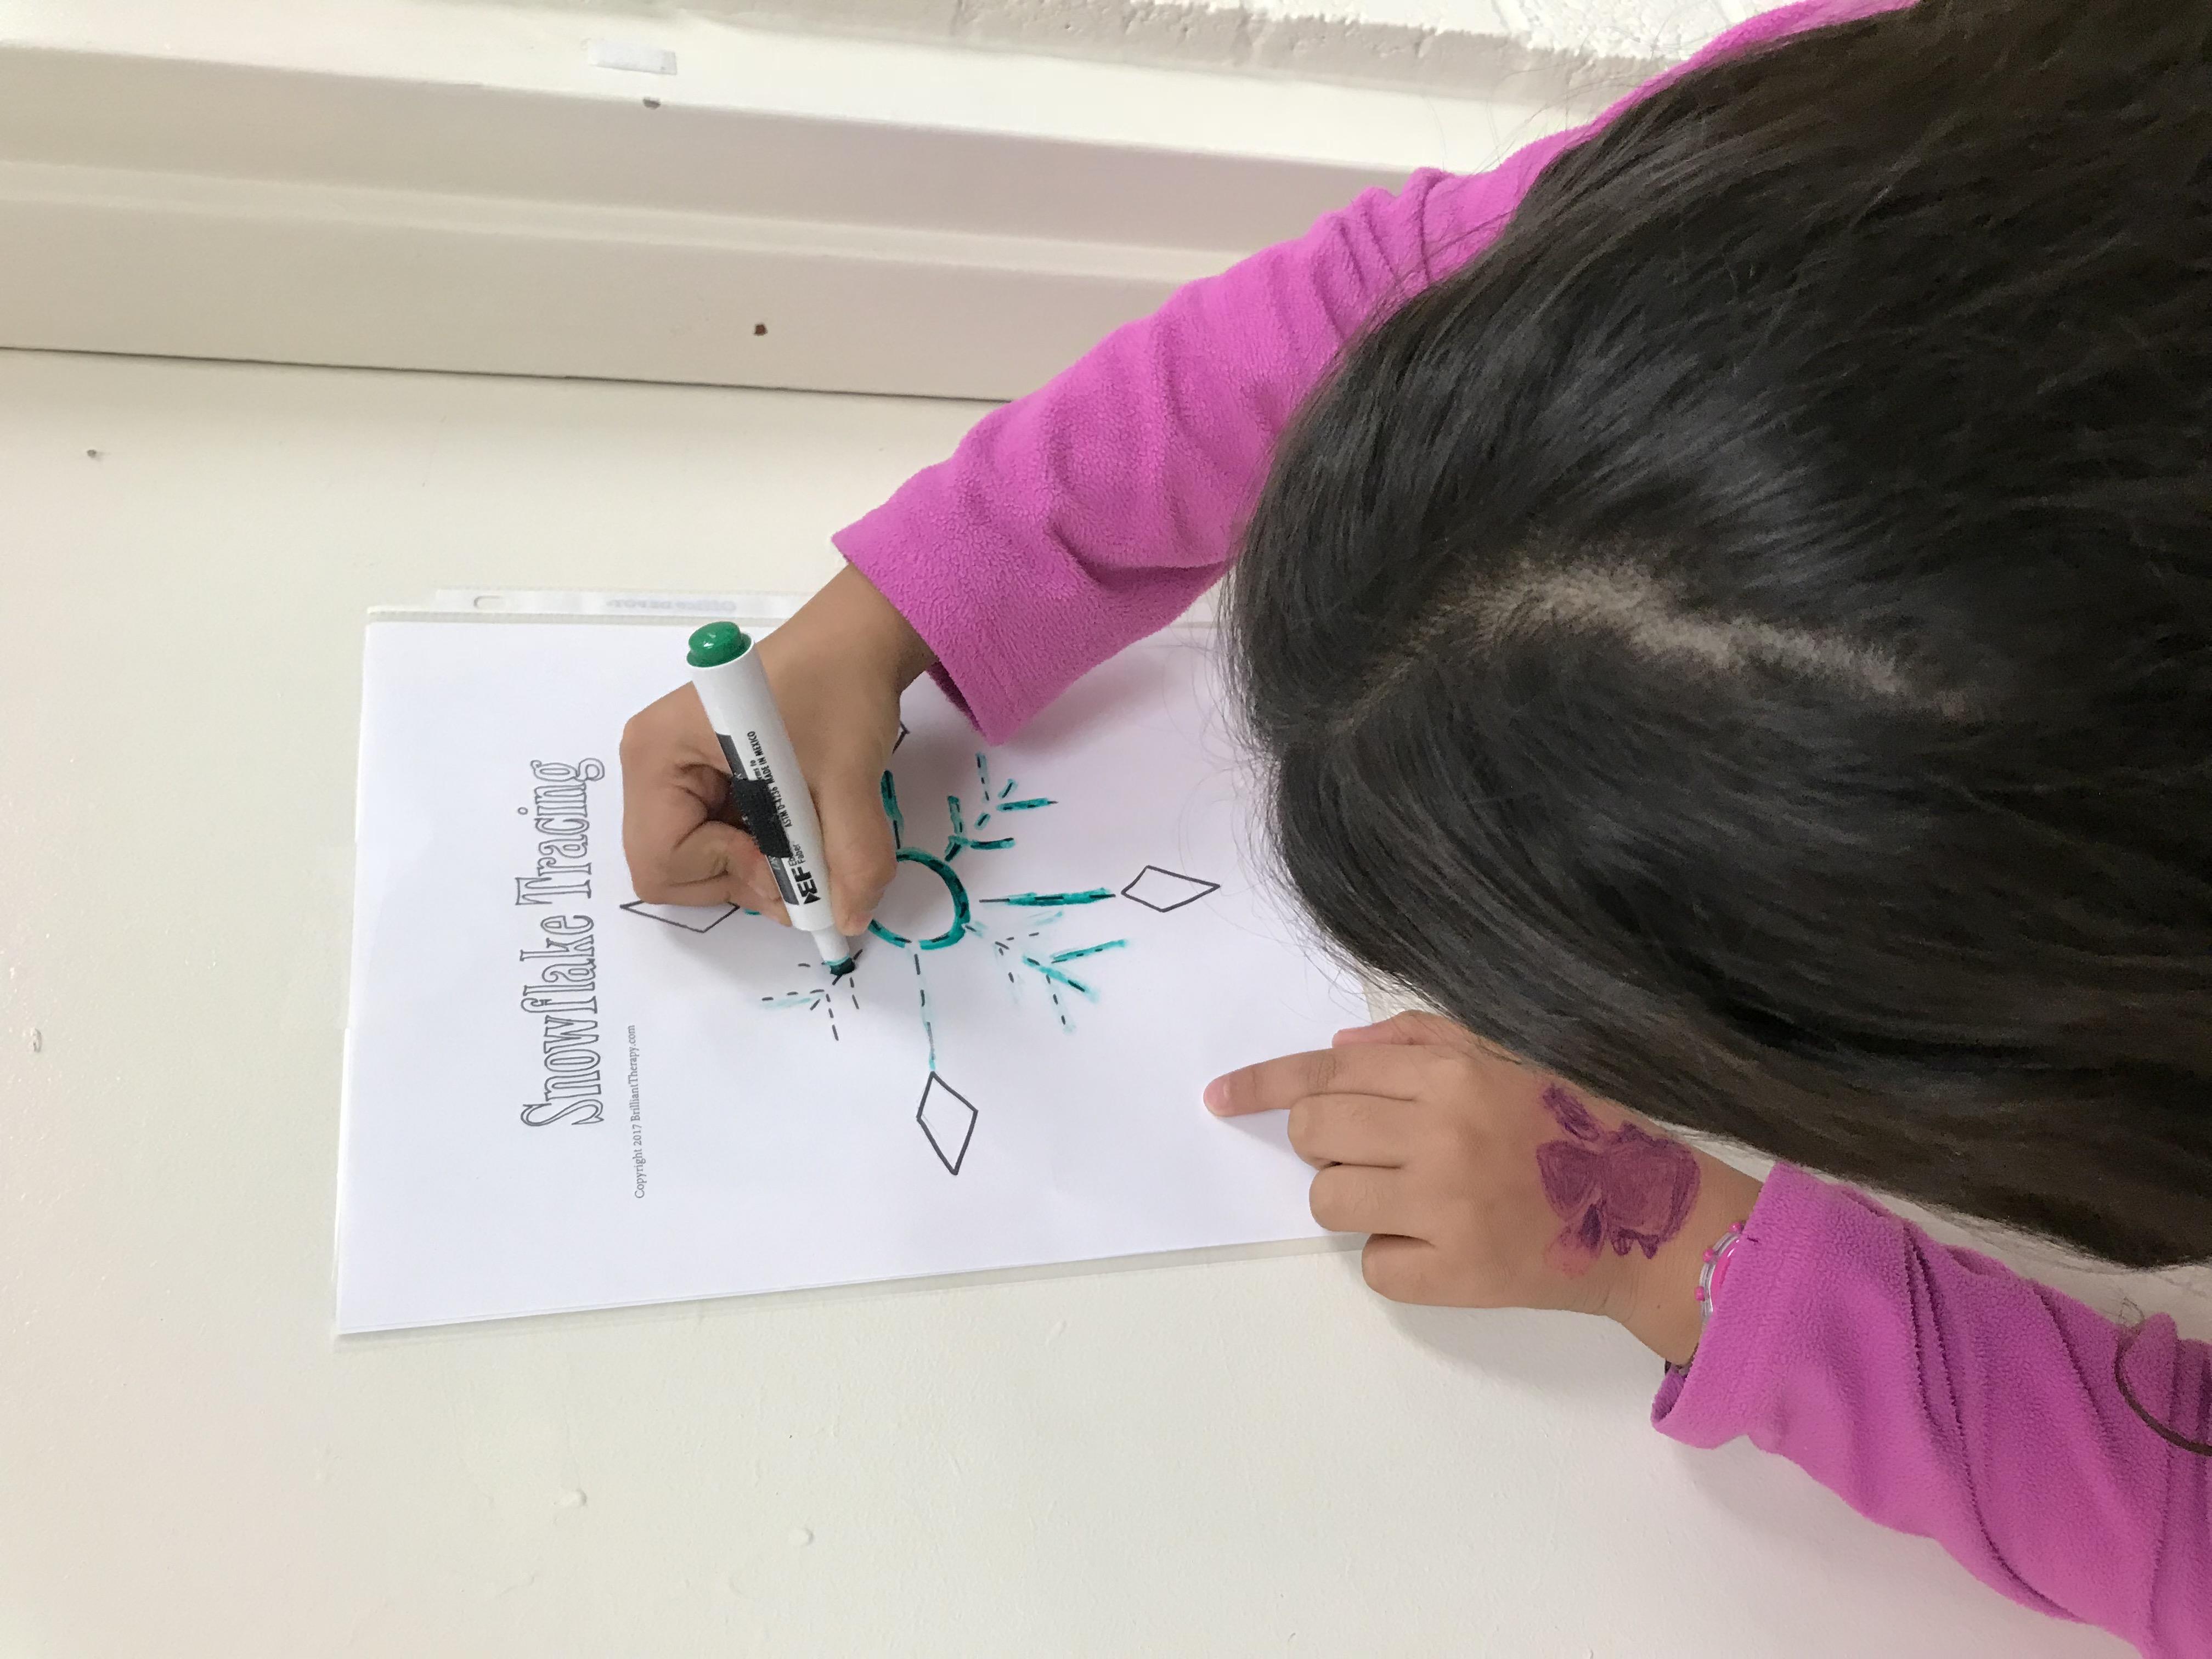 Kid drawing snowflake on template